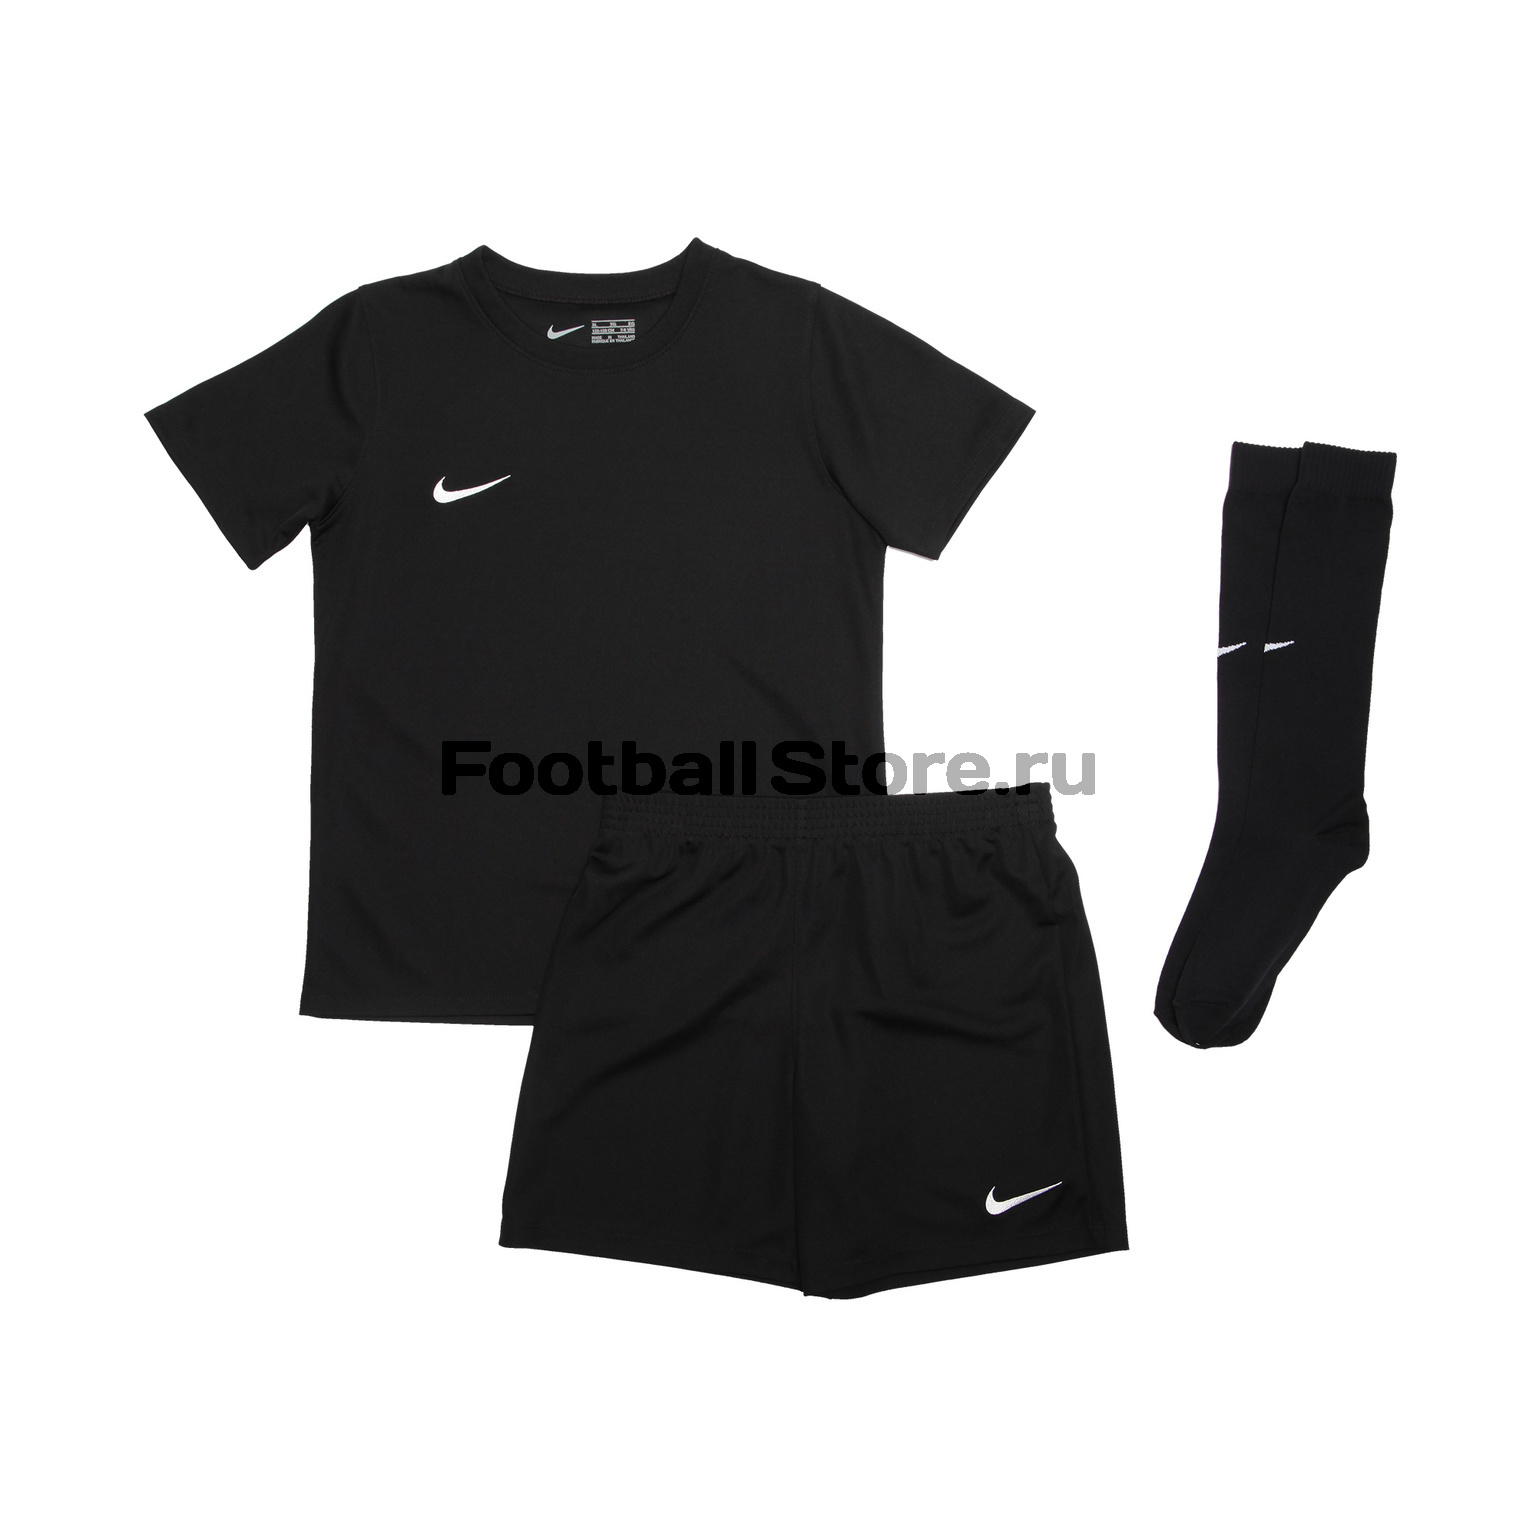 Комплект детской формы Nike Dry Park Kit AH5487-010